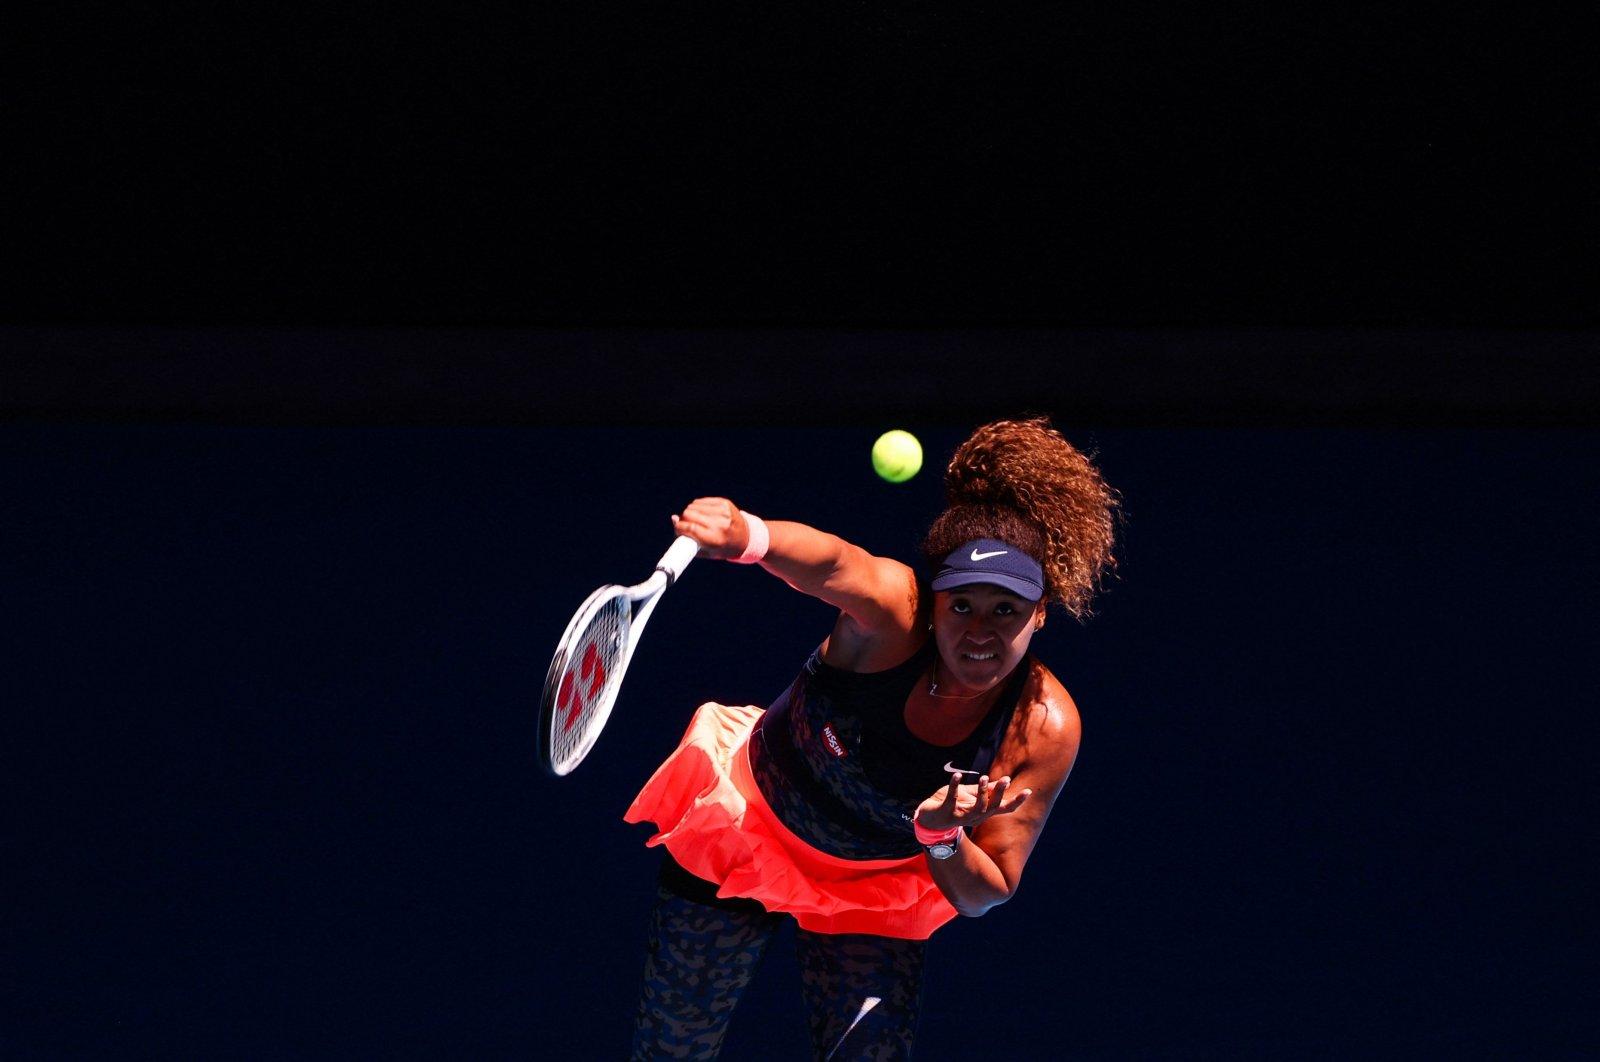 Japan's Naomi Osaka serves against U.S.' Serena Williams during the Australian Open women's singles semifinal match in Melbourne, Australia, Feb. 18, 2021. (AFP Photo)